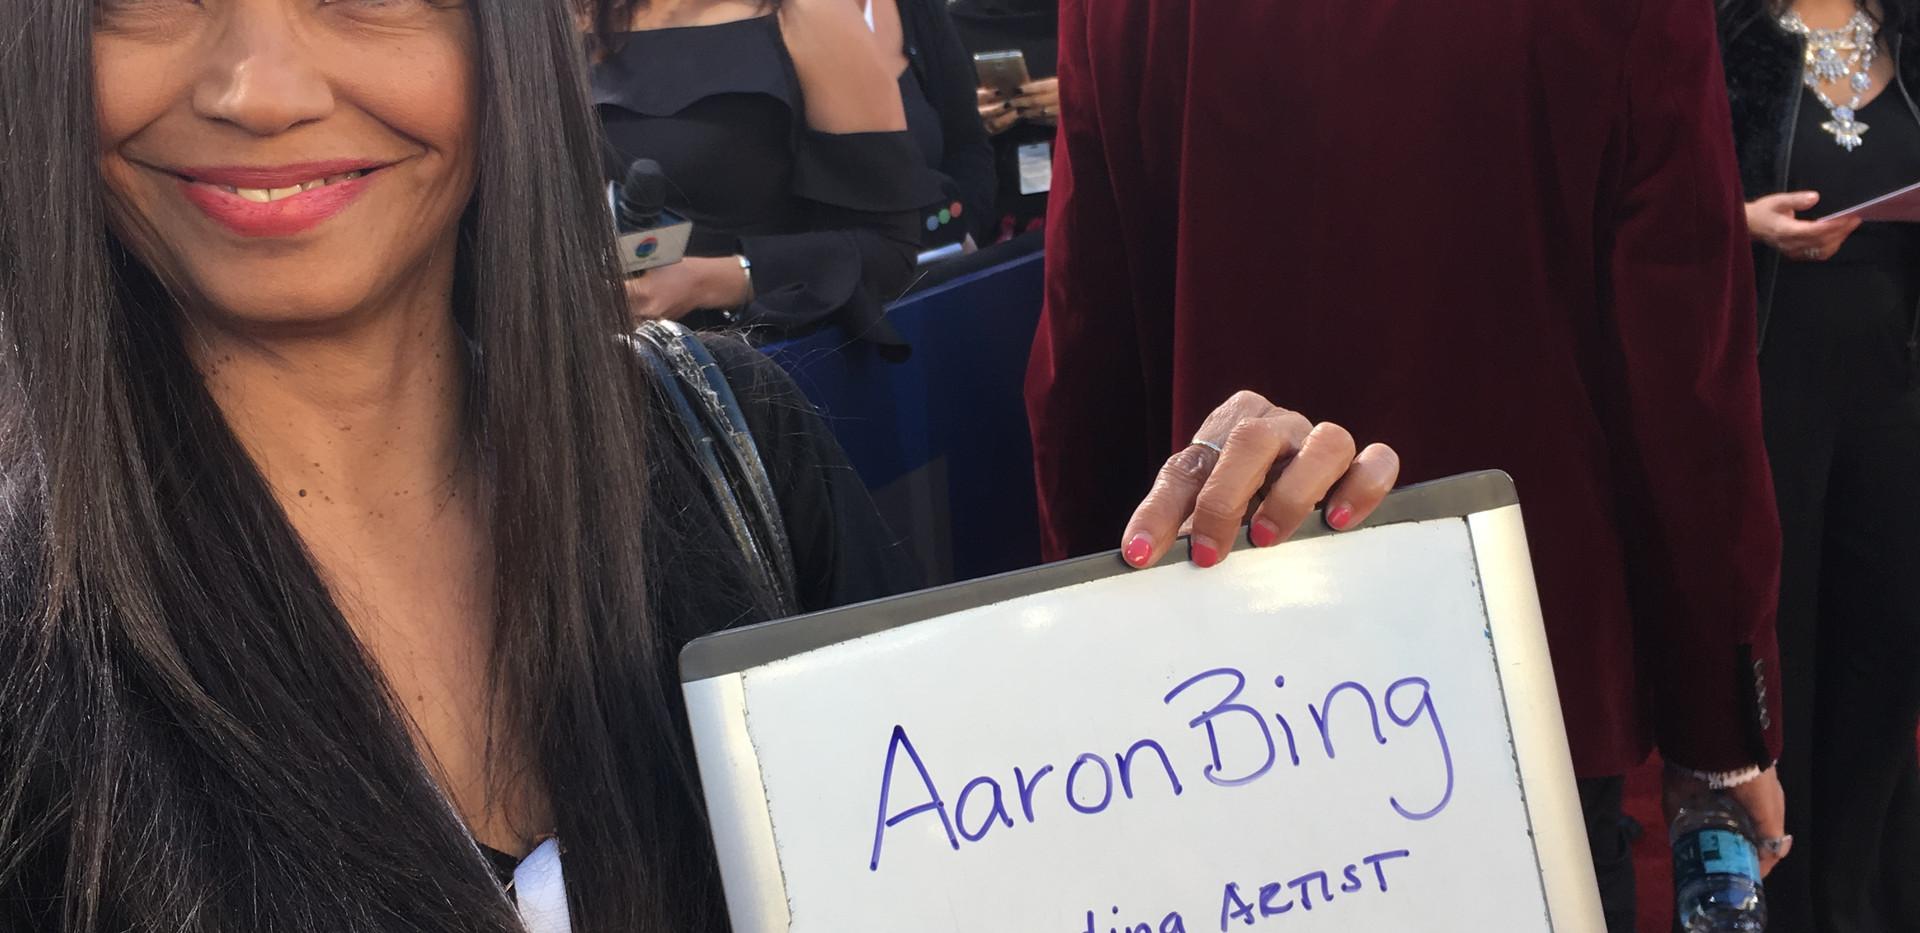 Aaron Bing Latin Grammys